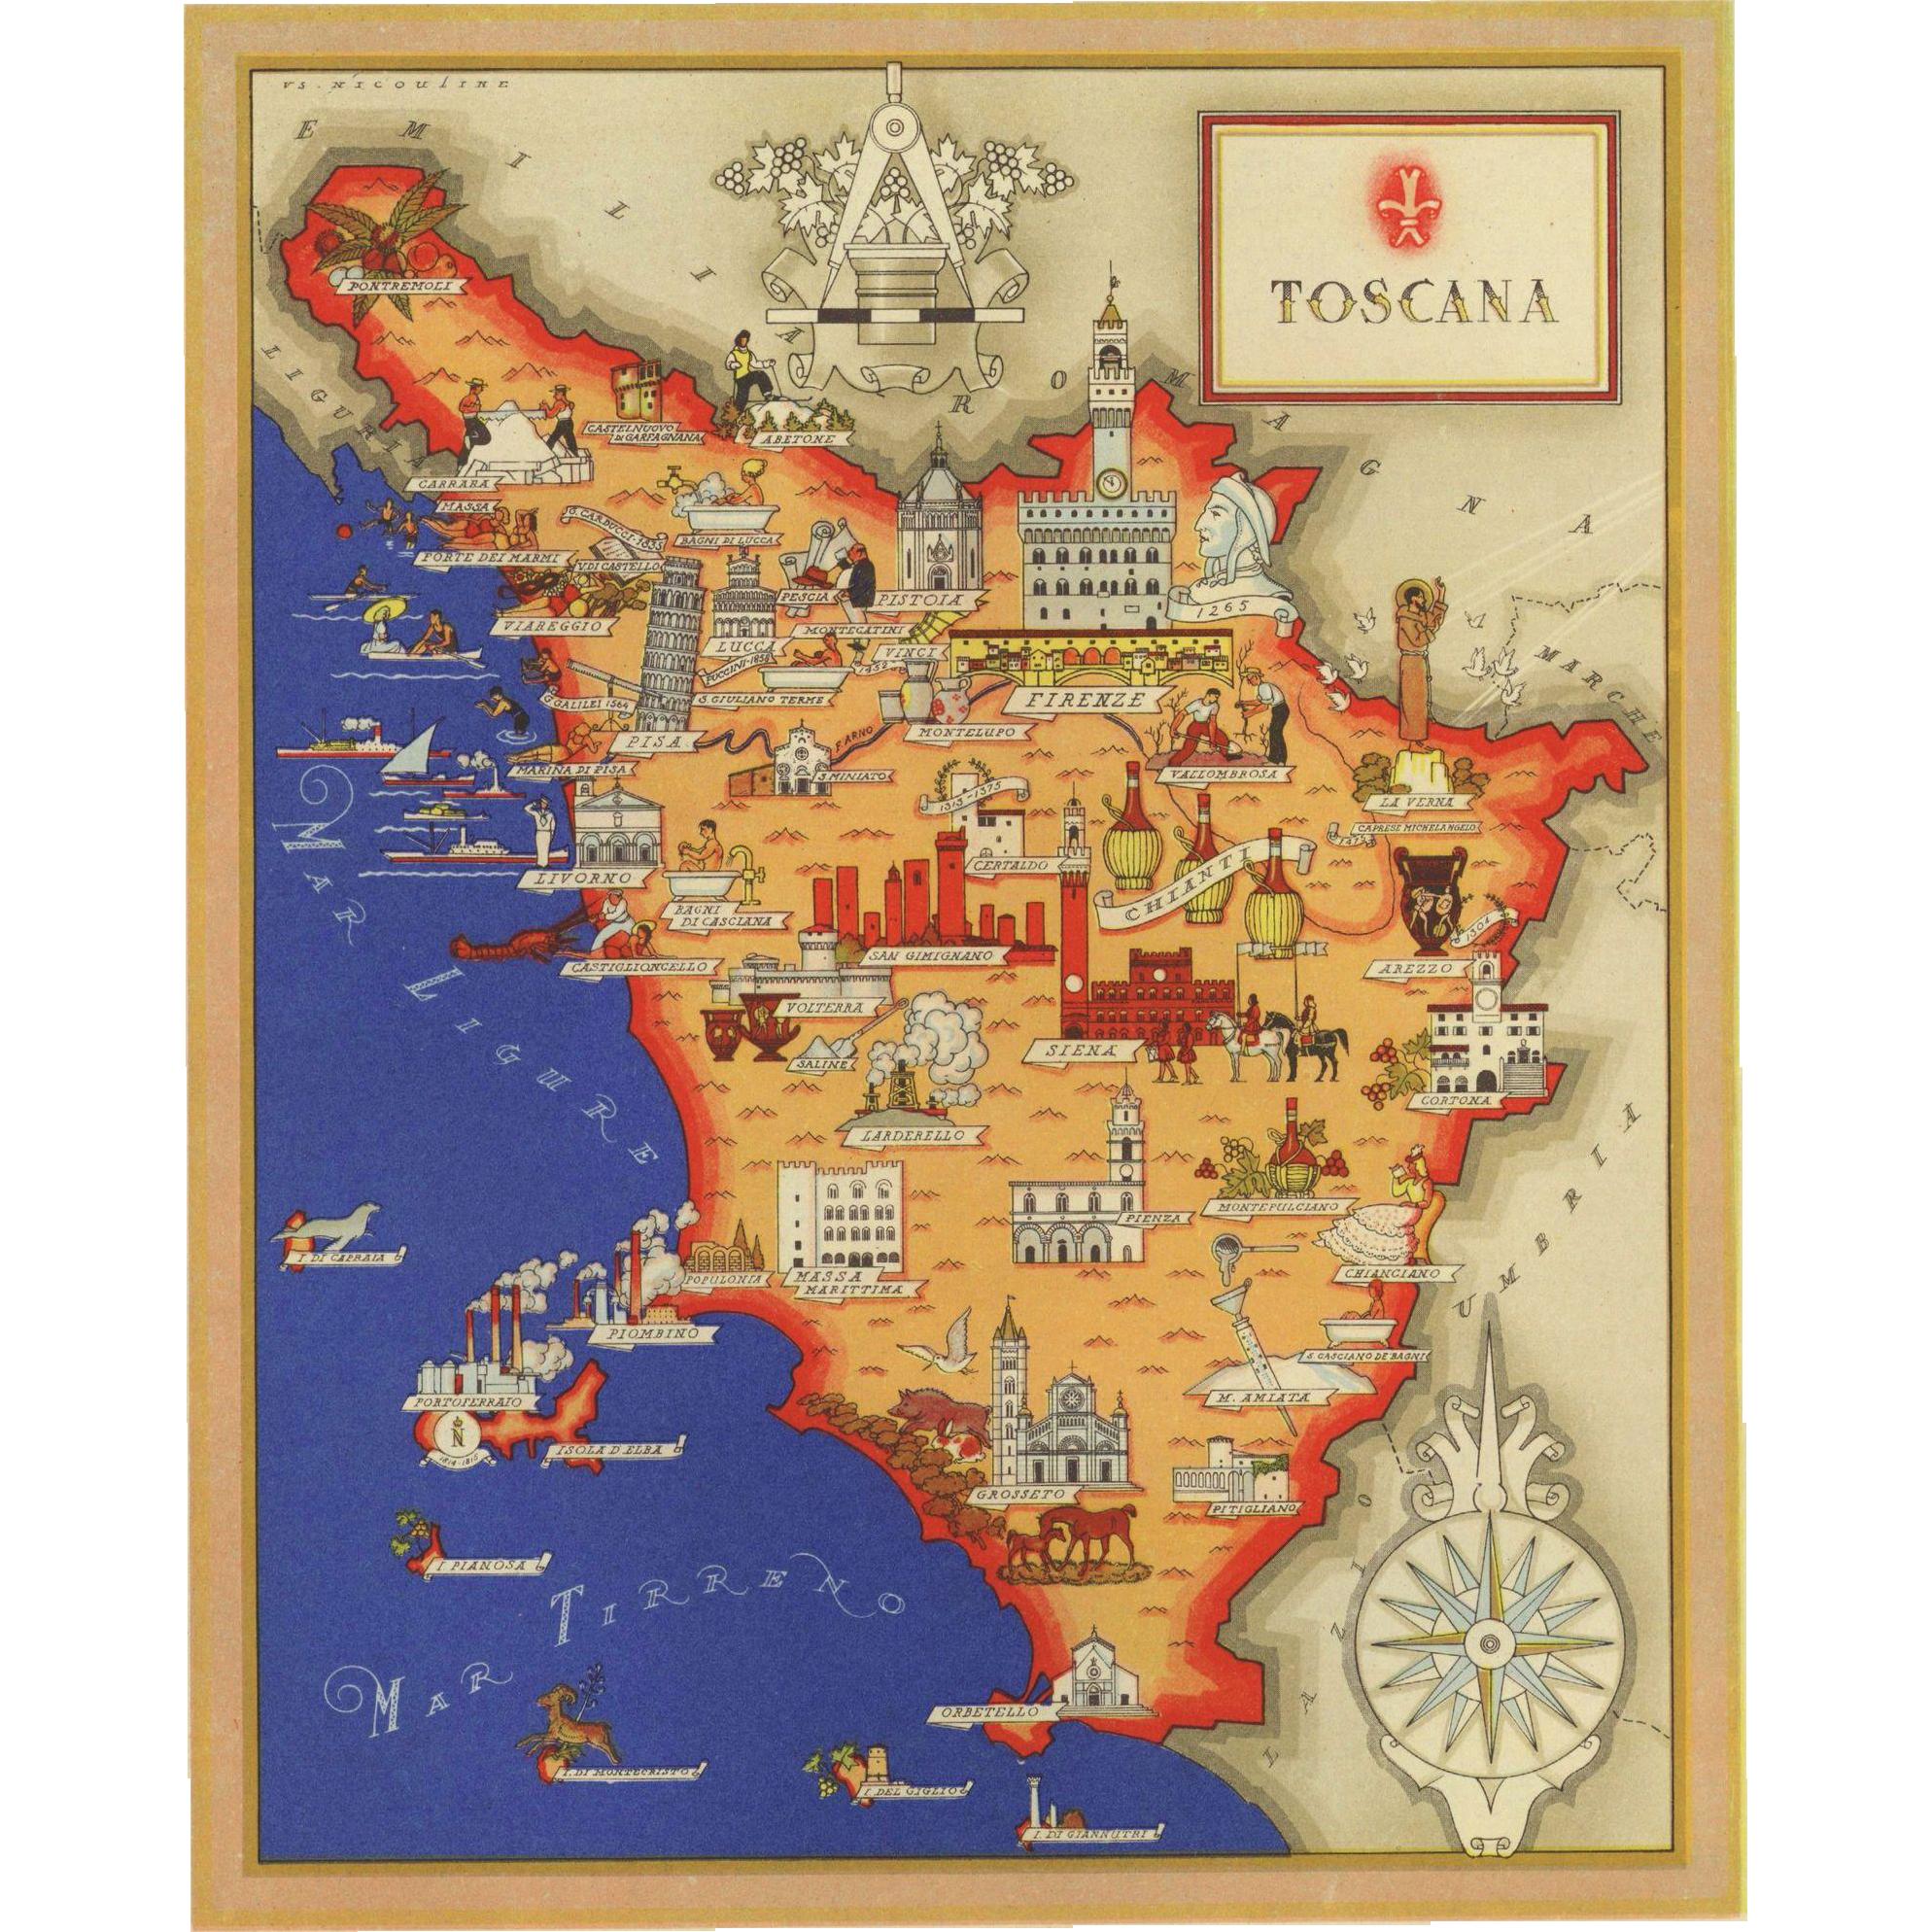 federnuoto toscana livorno map - photo#30